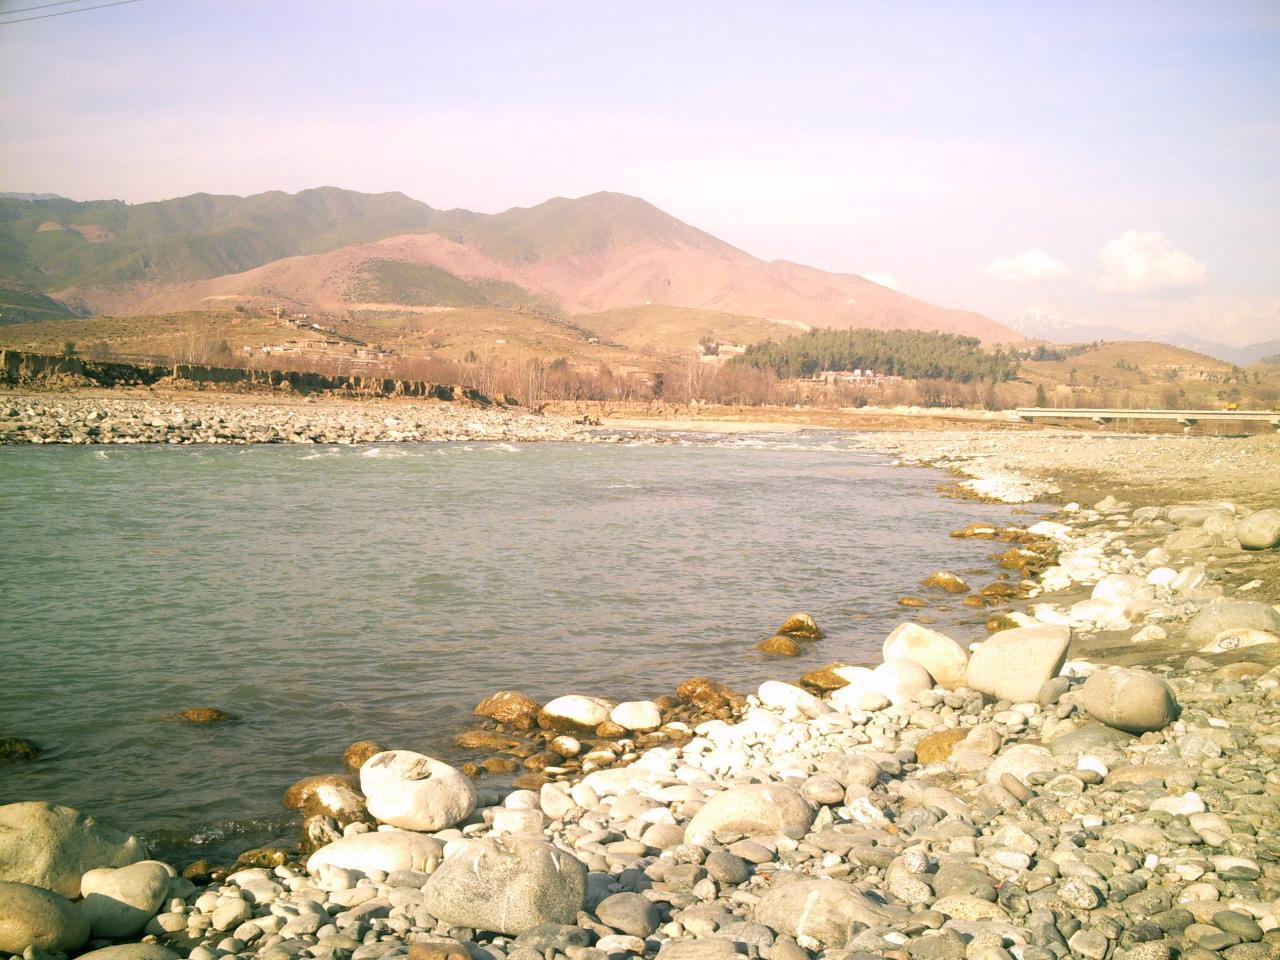 Panjkora River near Sangum